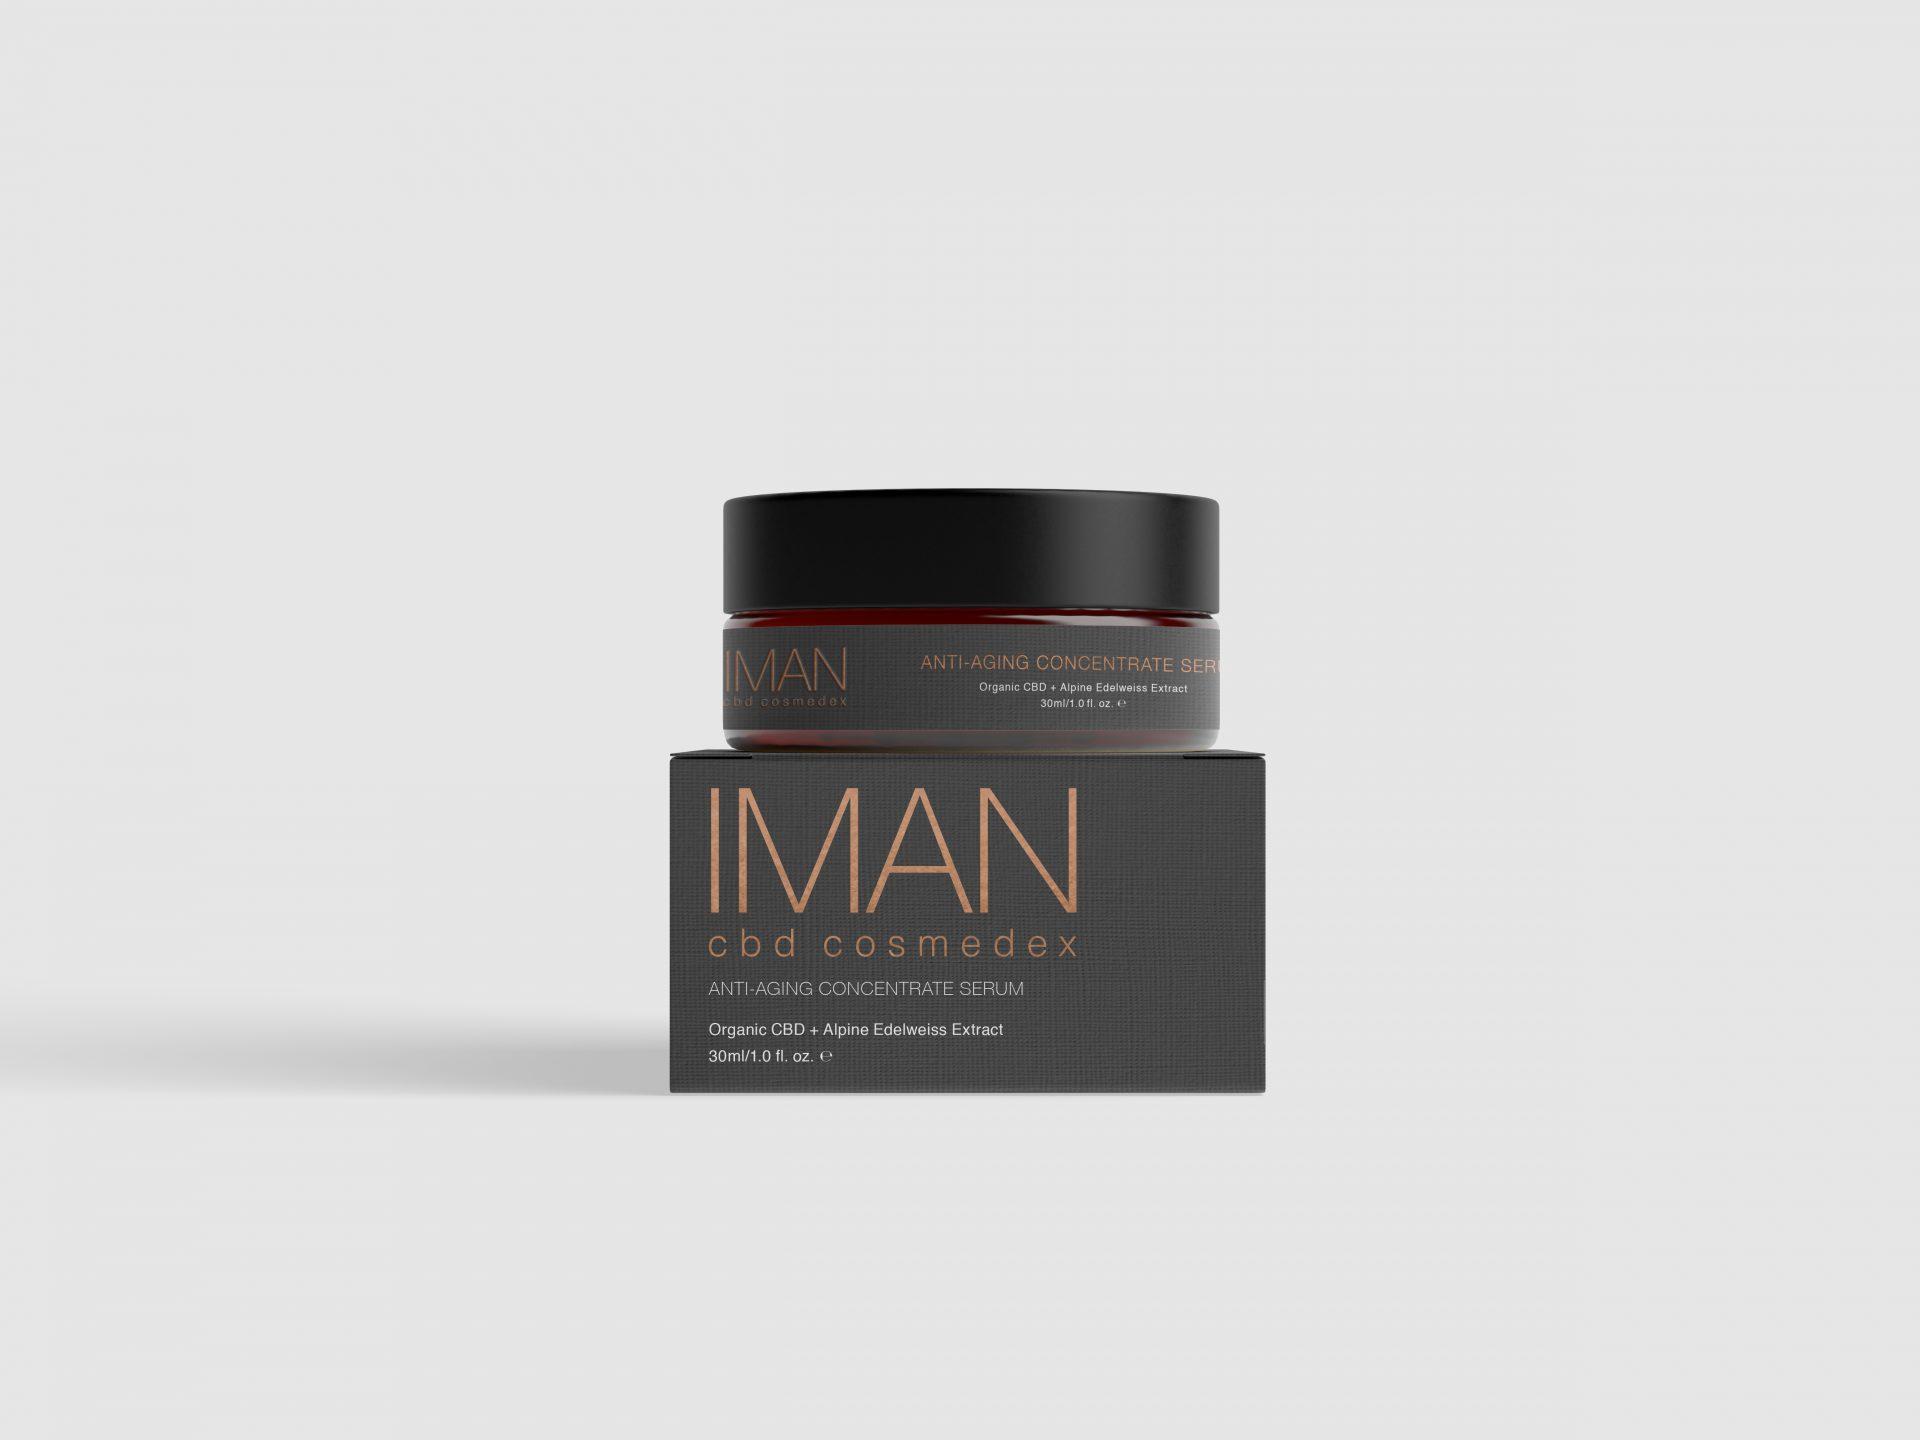 IMAN CBD Cosmedex (Concept Art)